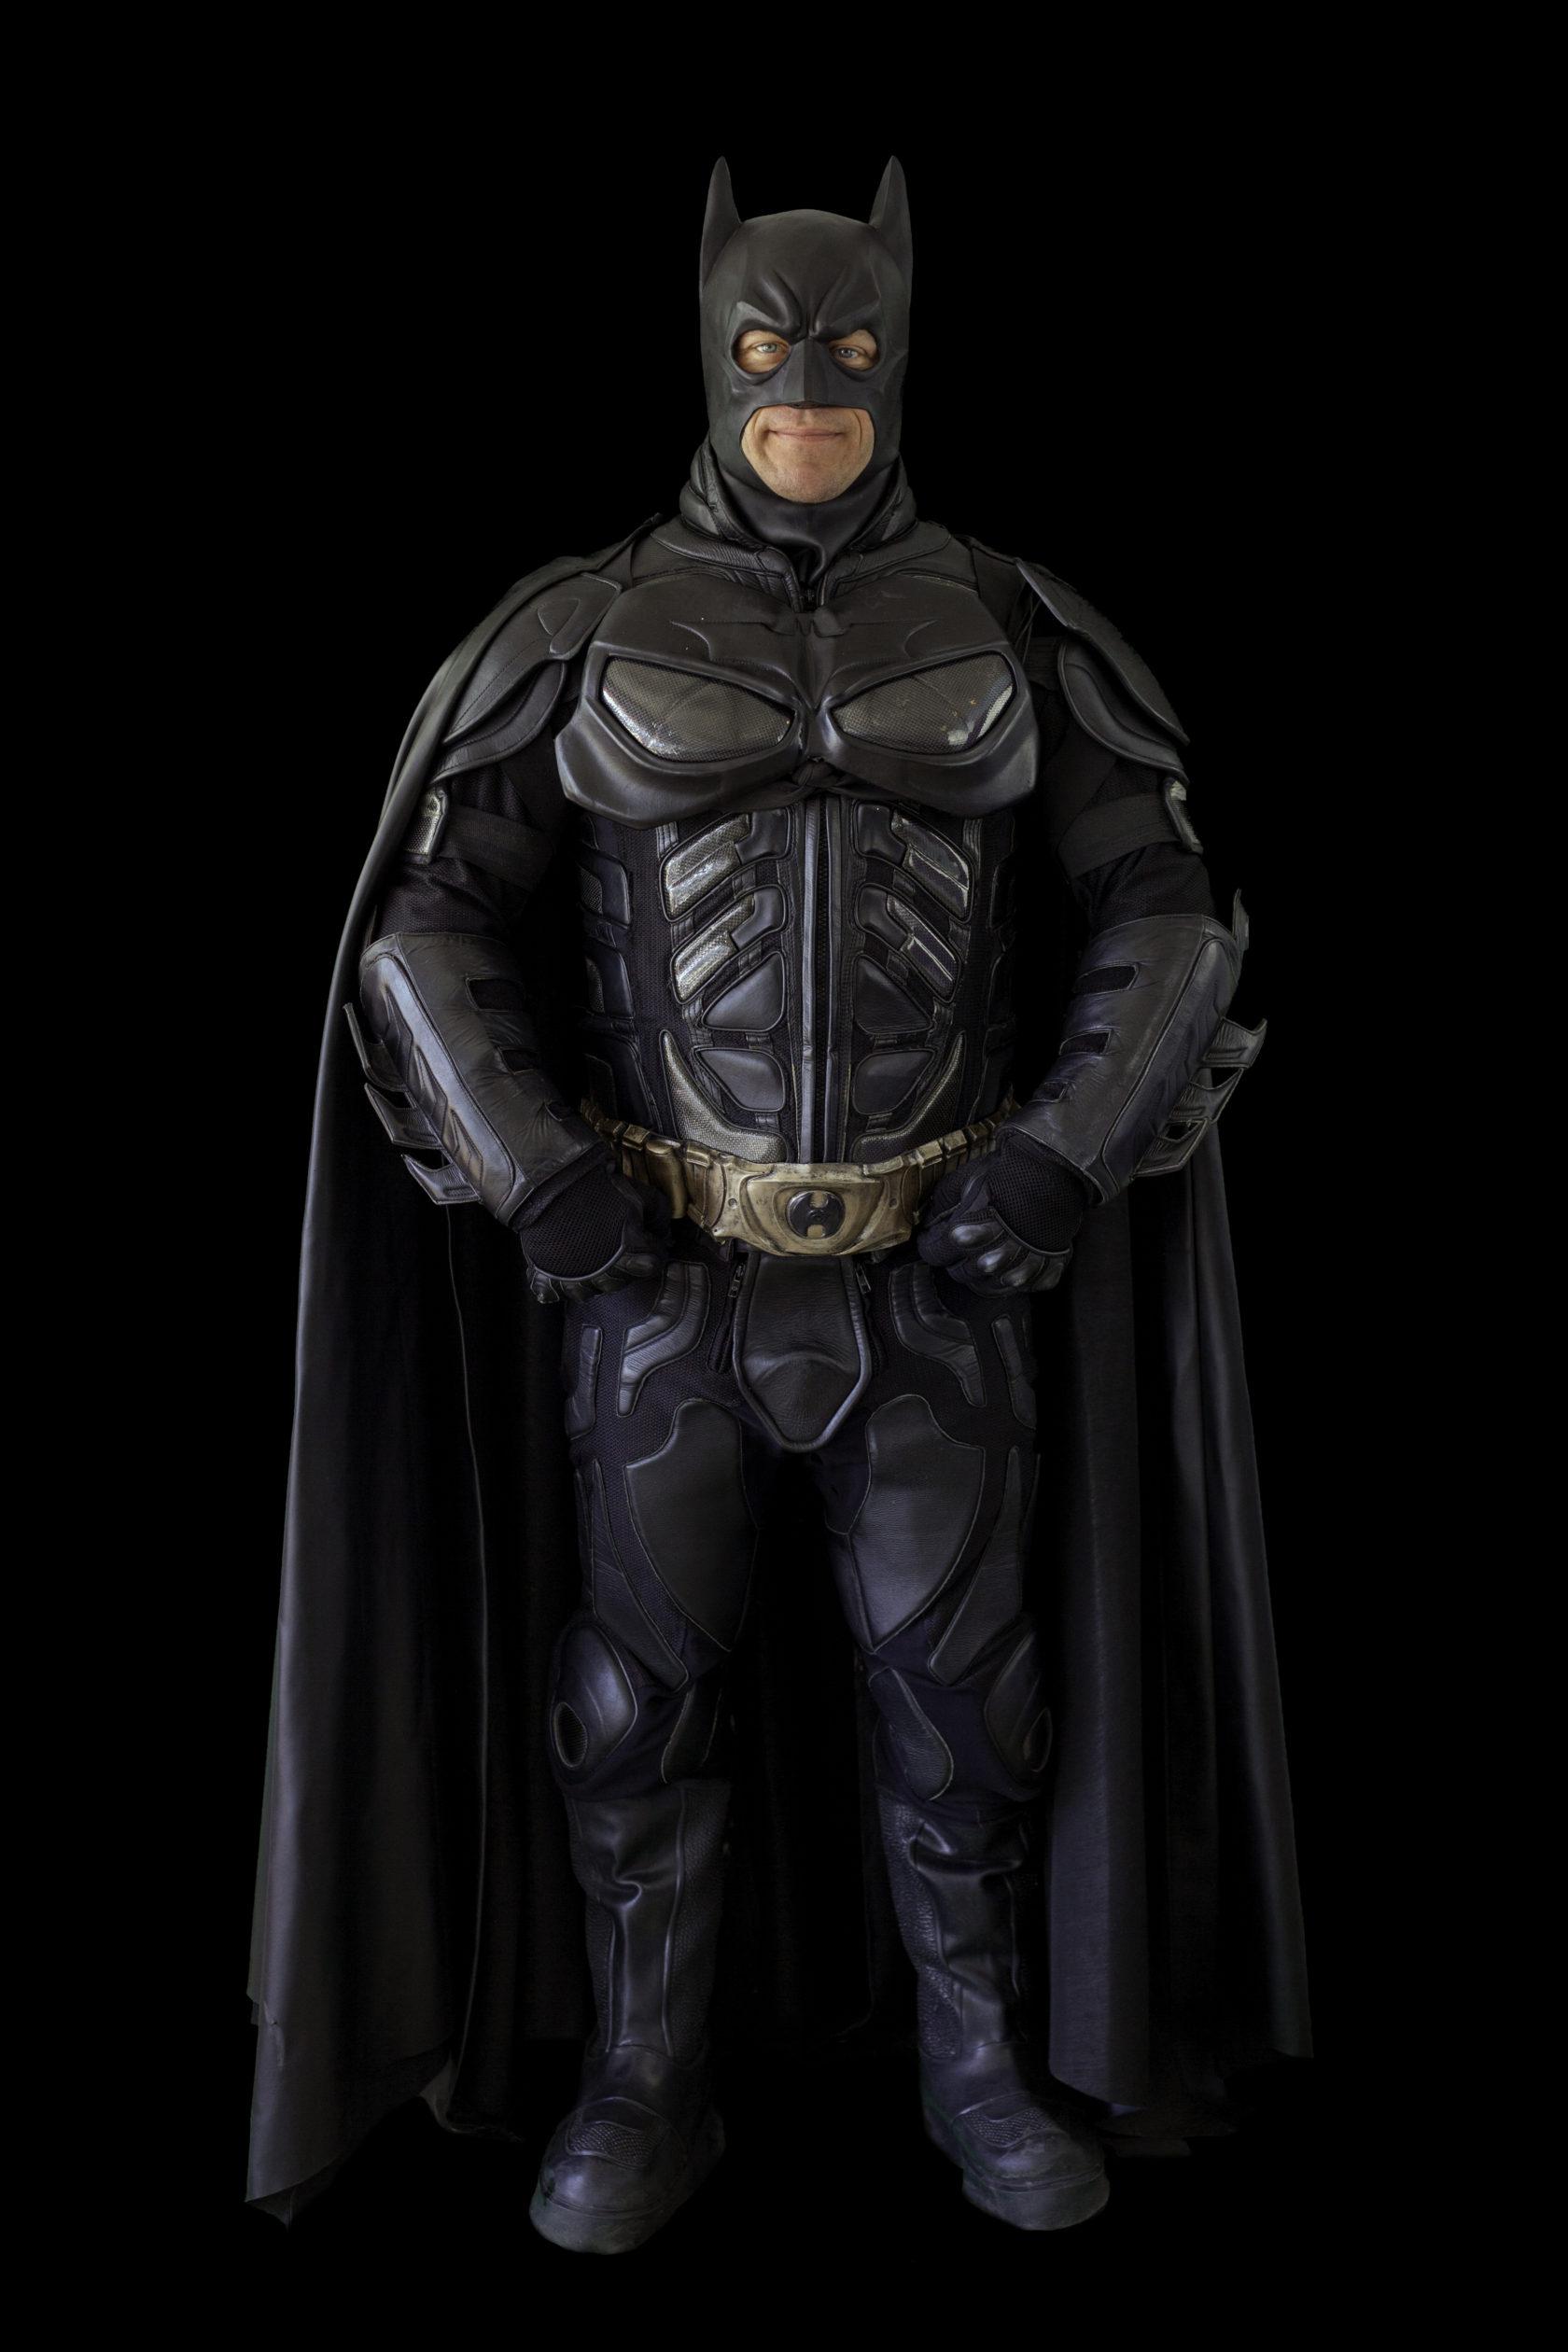 Batman Full Body Black